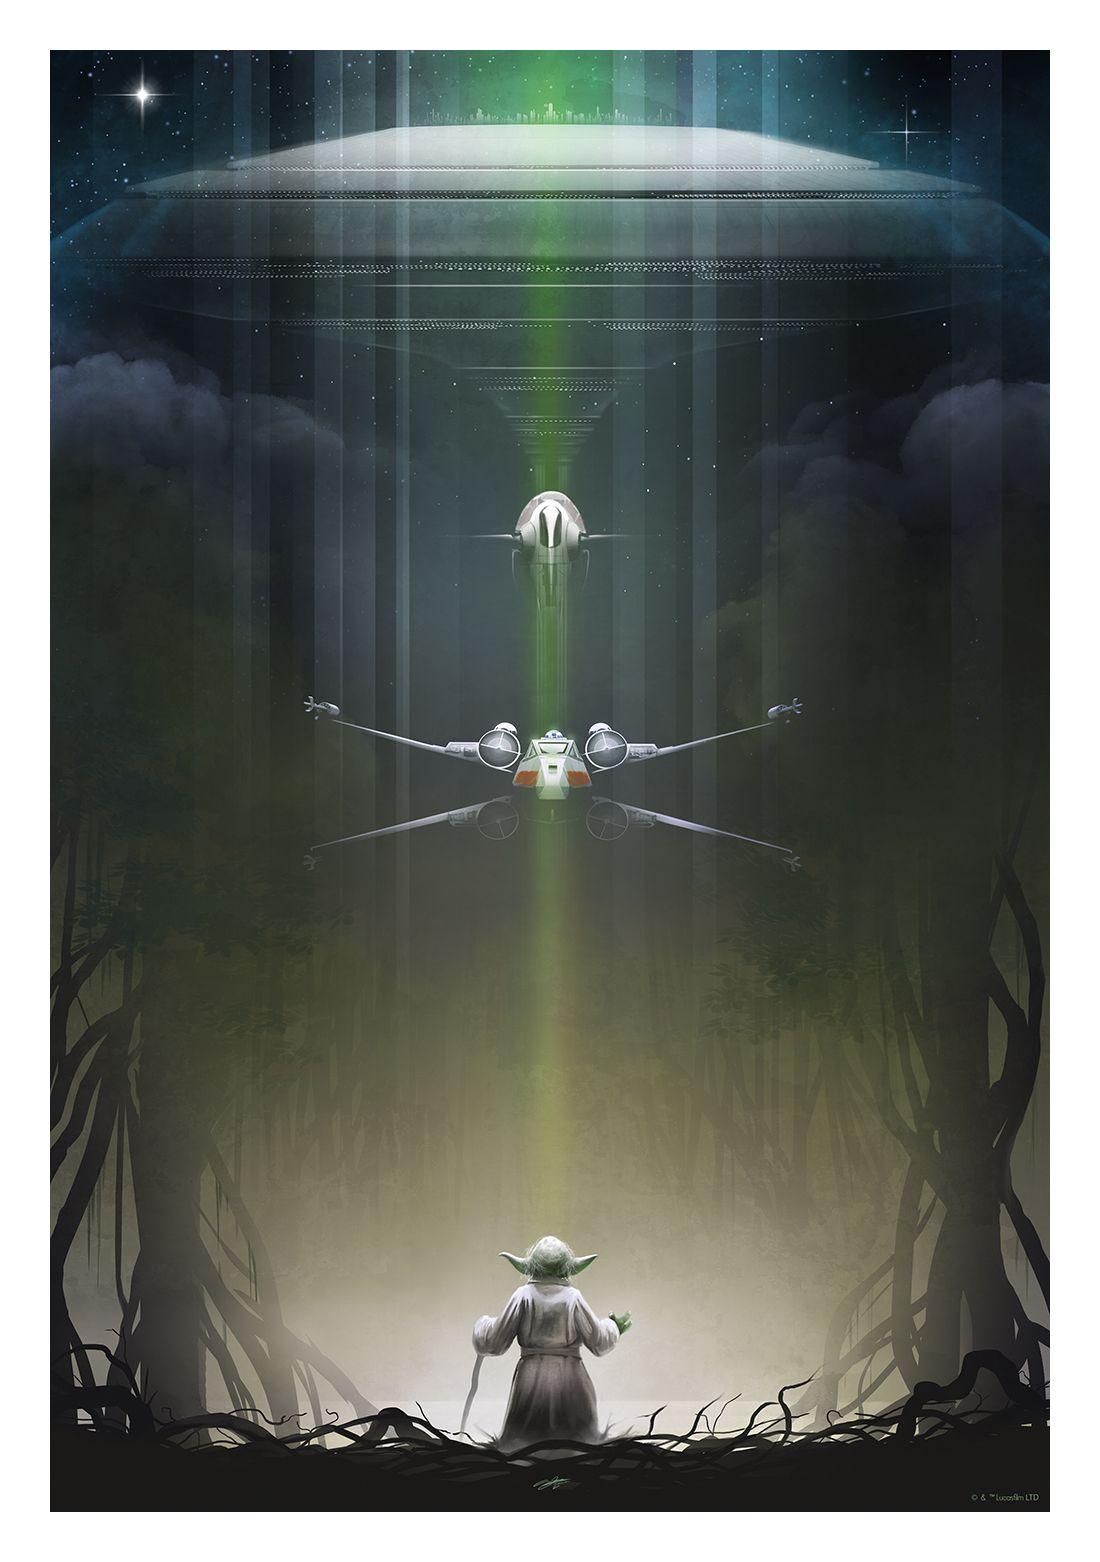 Yoda by Andy Fairhurst.